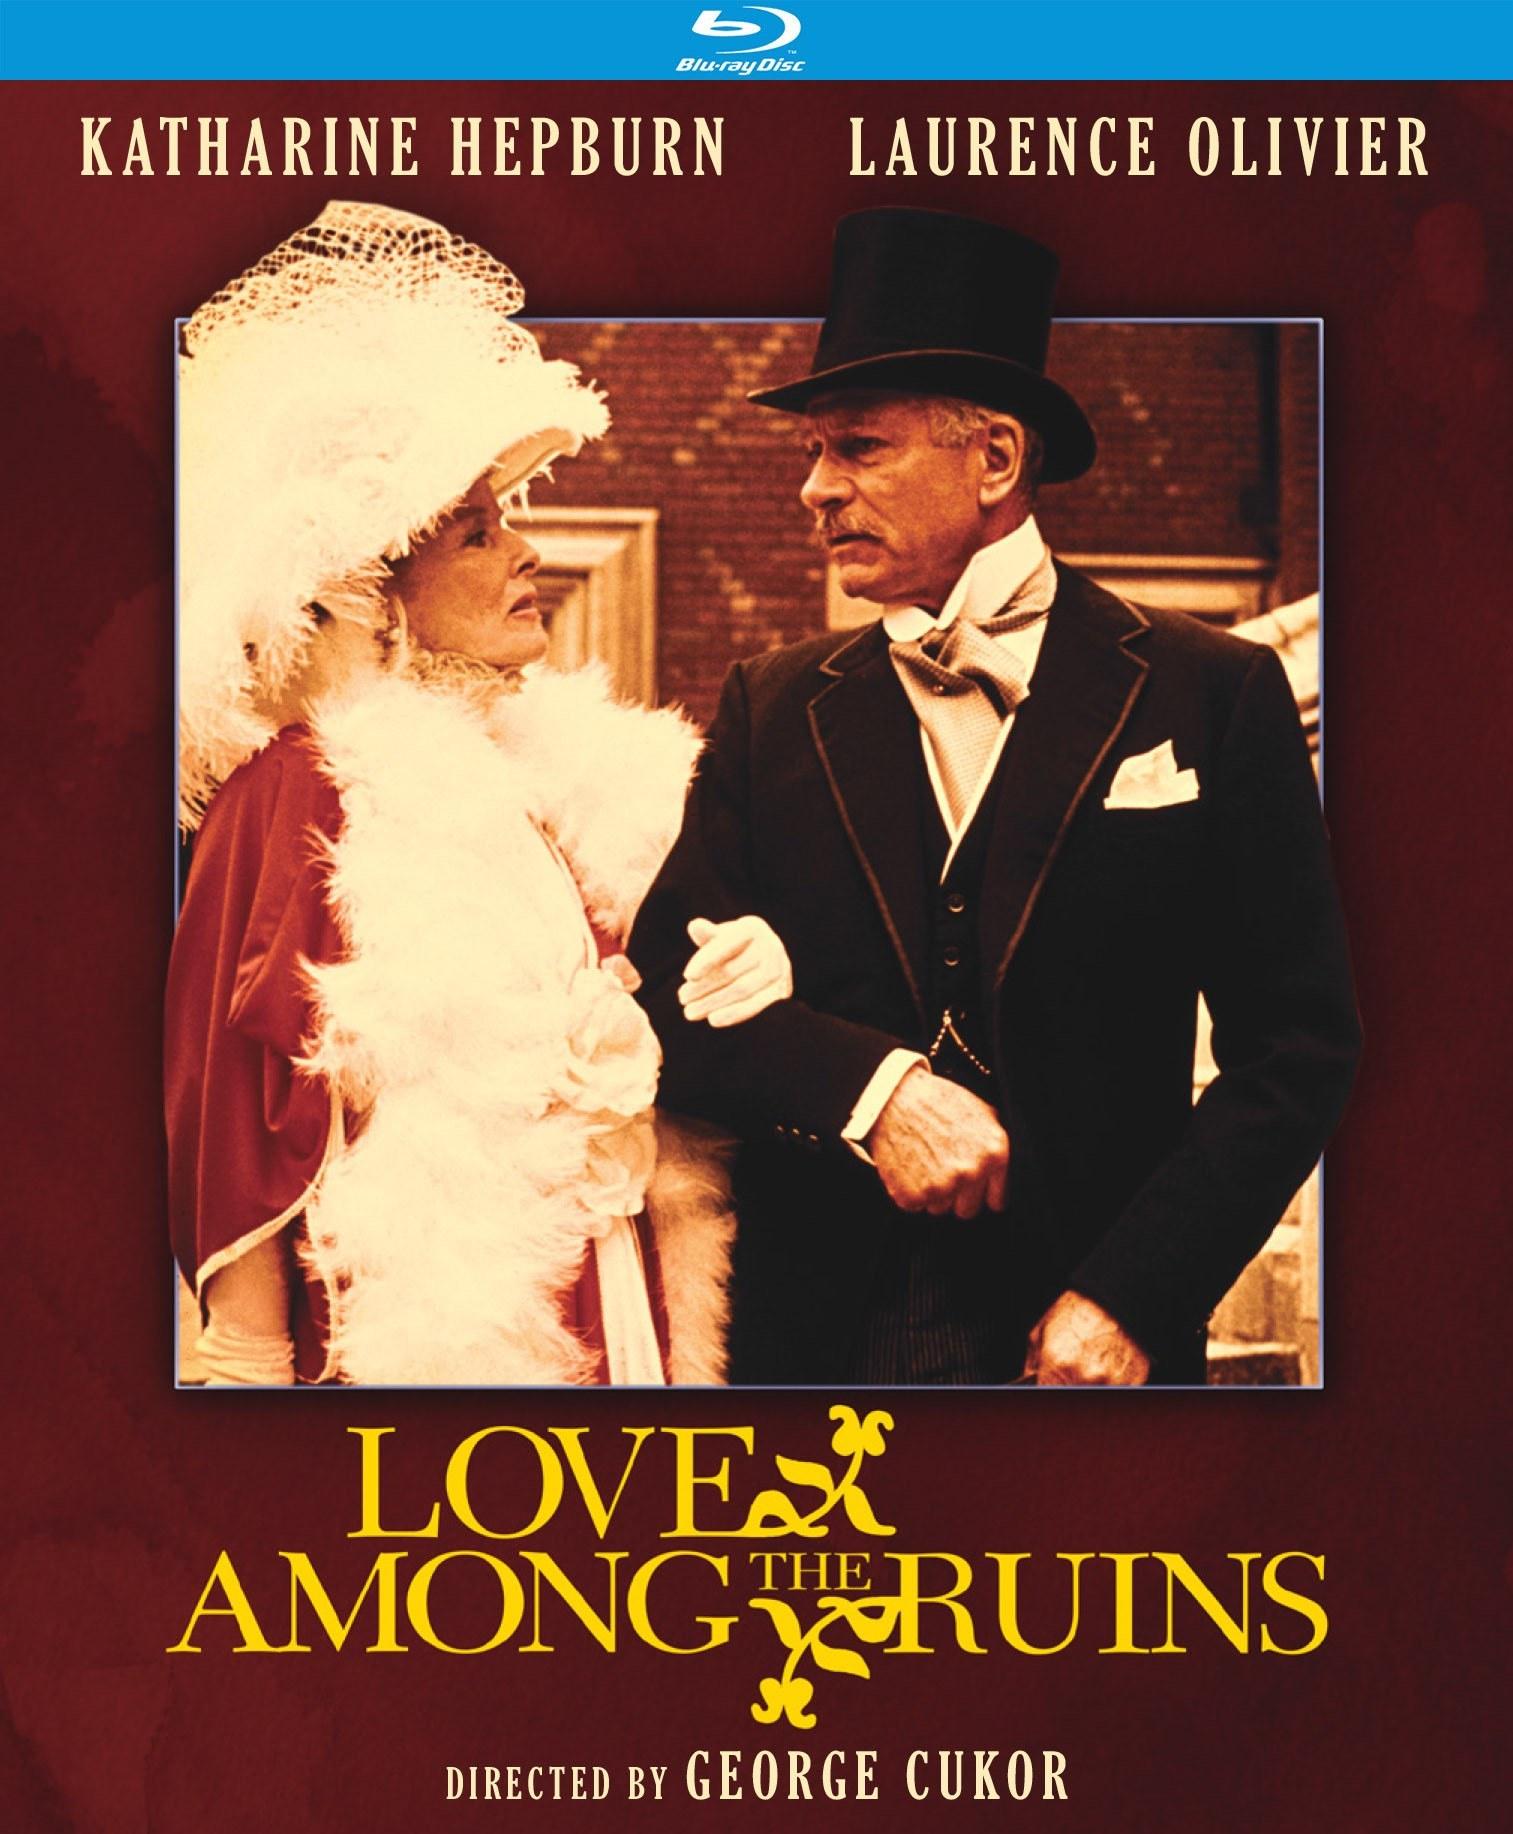 Love Among the Ruins (1975)